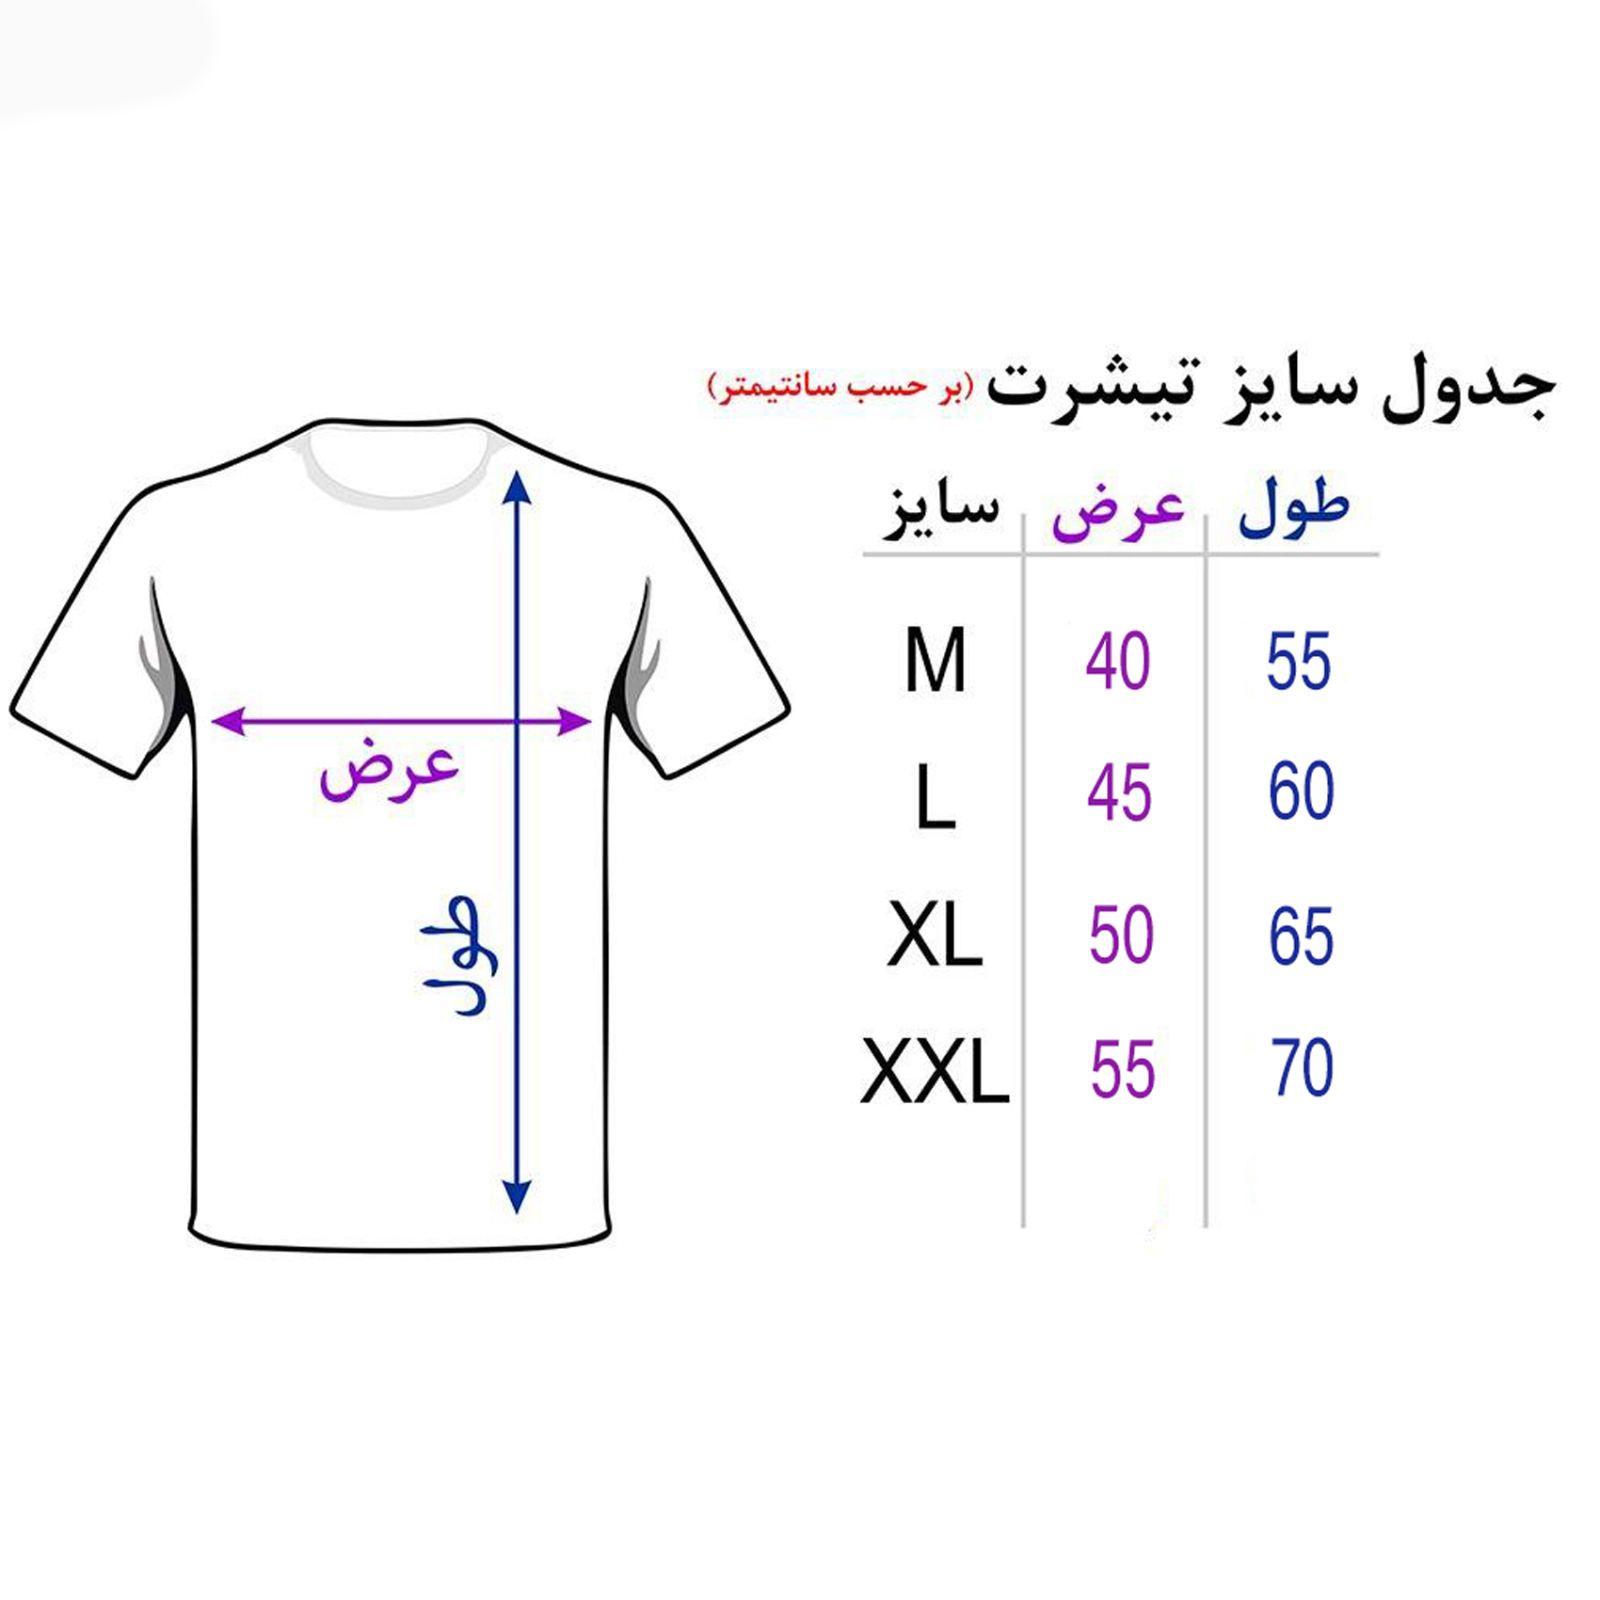 تی شرت مردانه 27  طرح هیچ کد B125 -  - 4